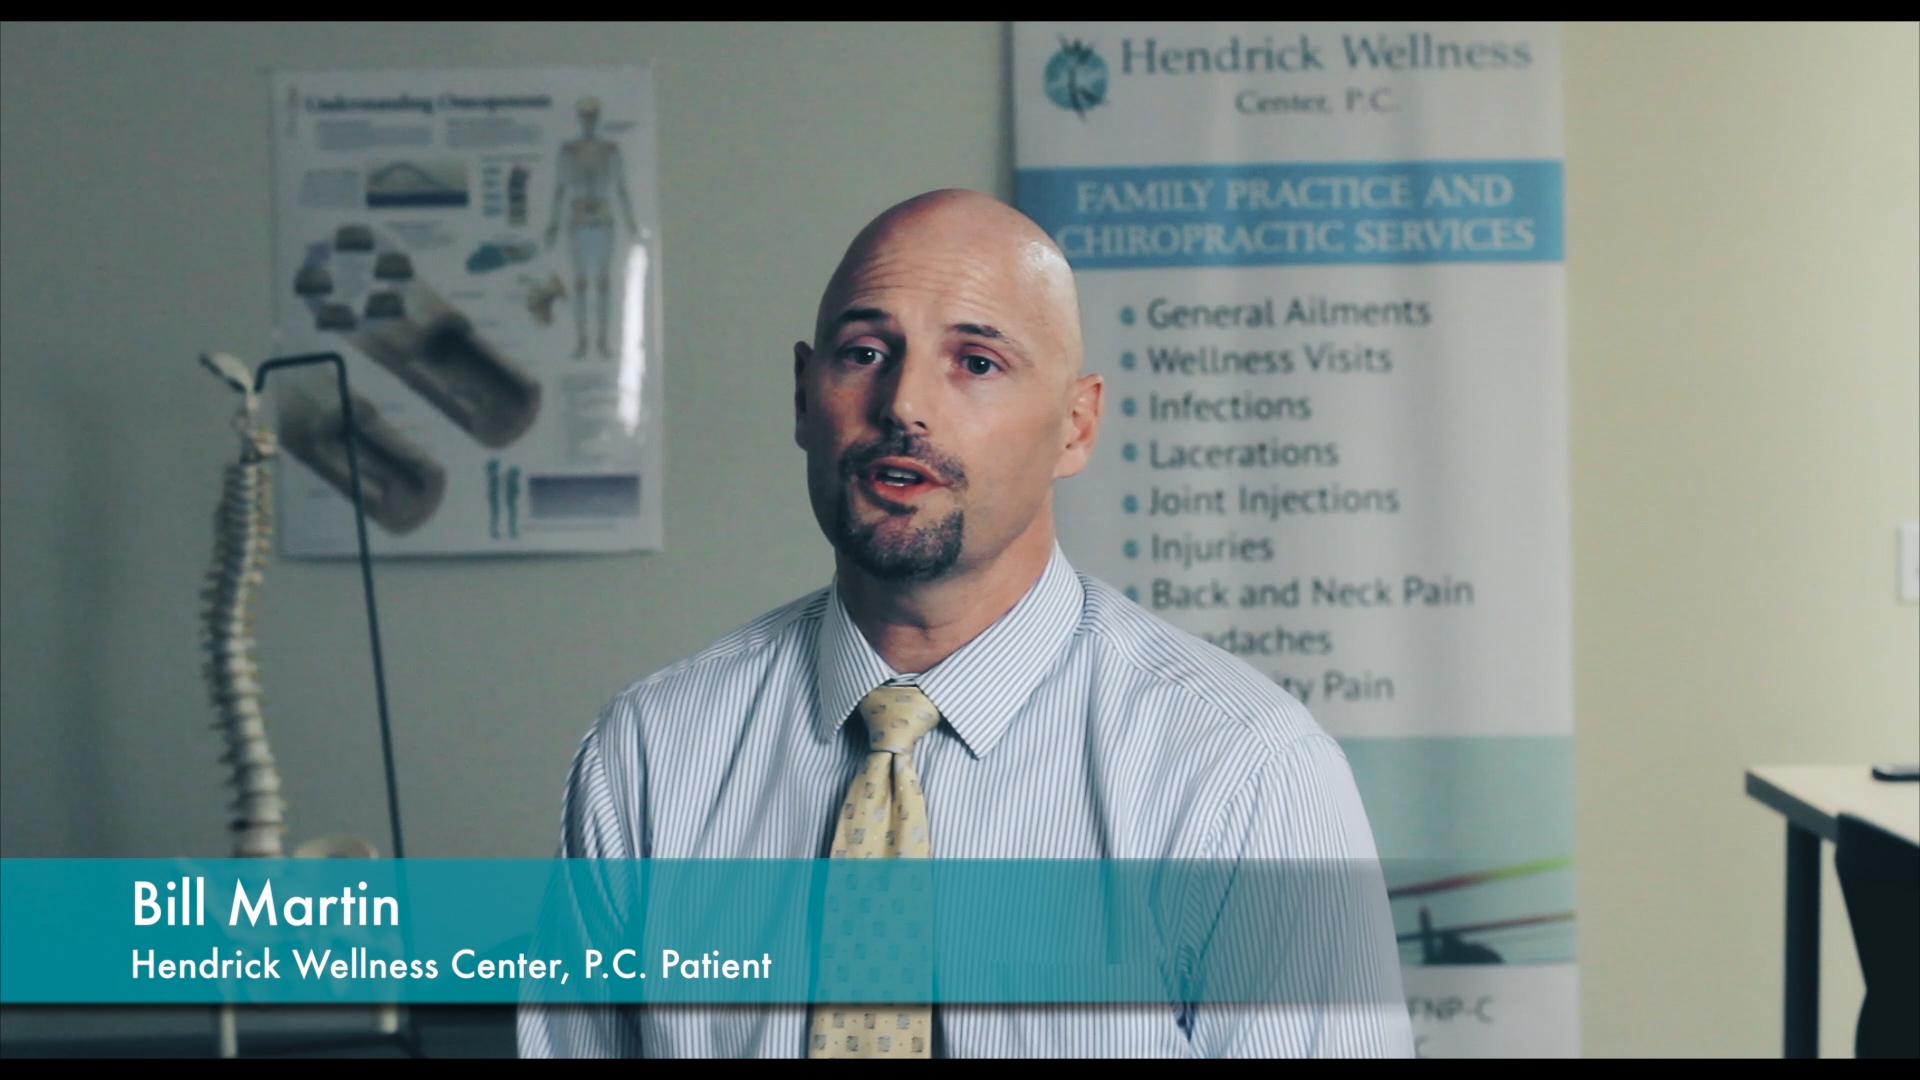 Hendrick Wellness Center, P.C. _ Testimonial _ Bill Martin (1)